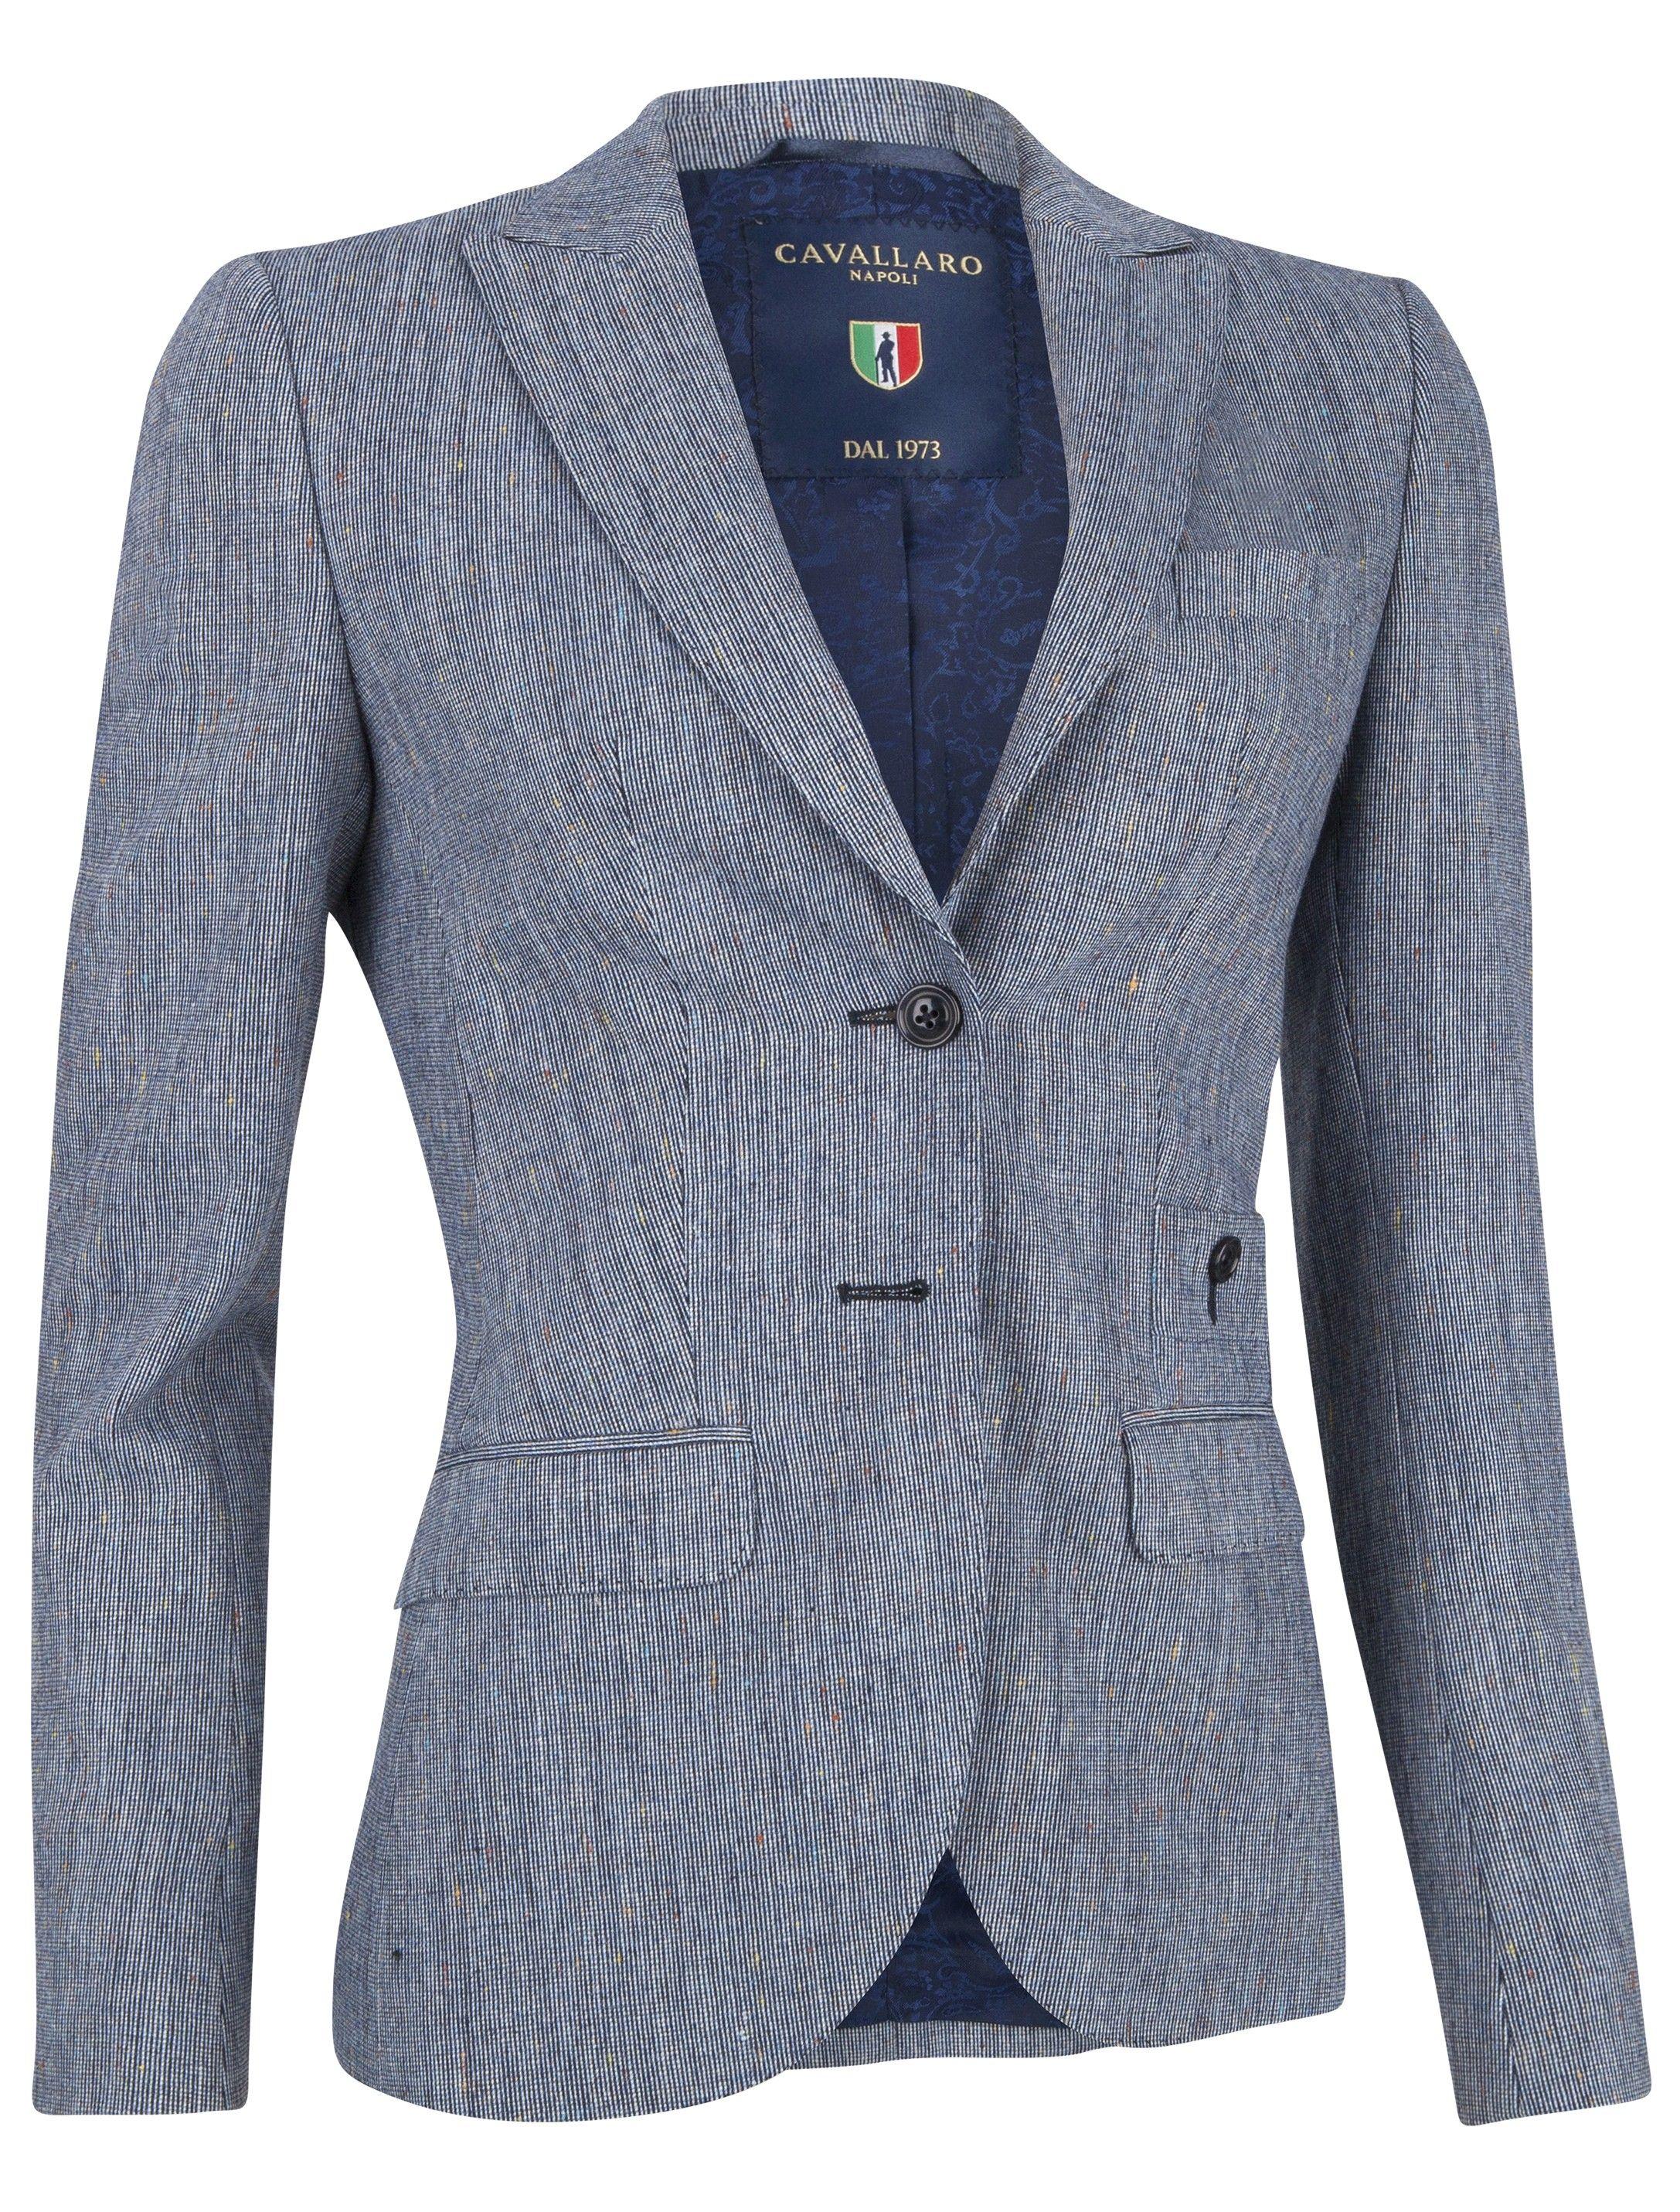 Napoli Cavallaro Collectienewarrivalsblazer Blazer Fw'15 Pula e29DHbWIEY